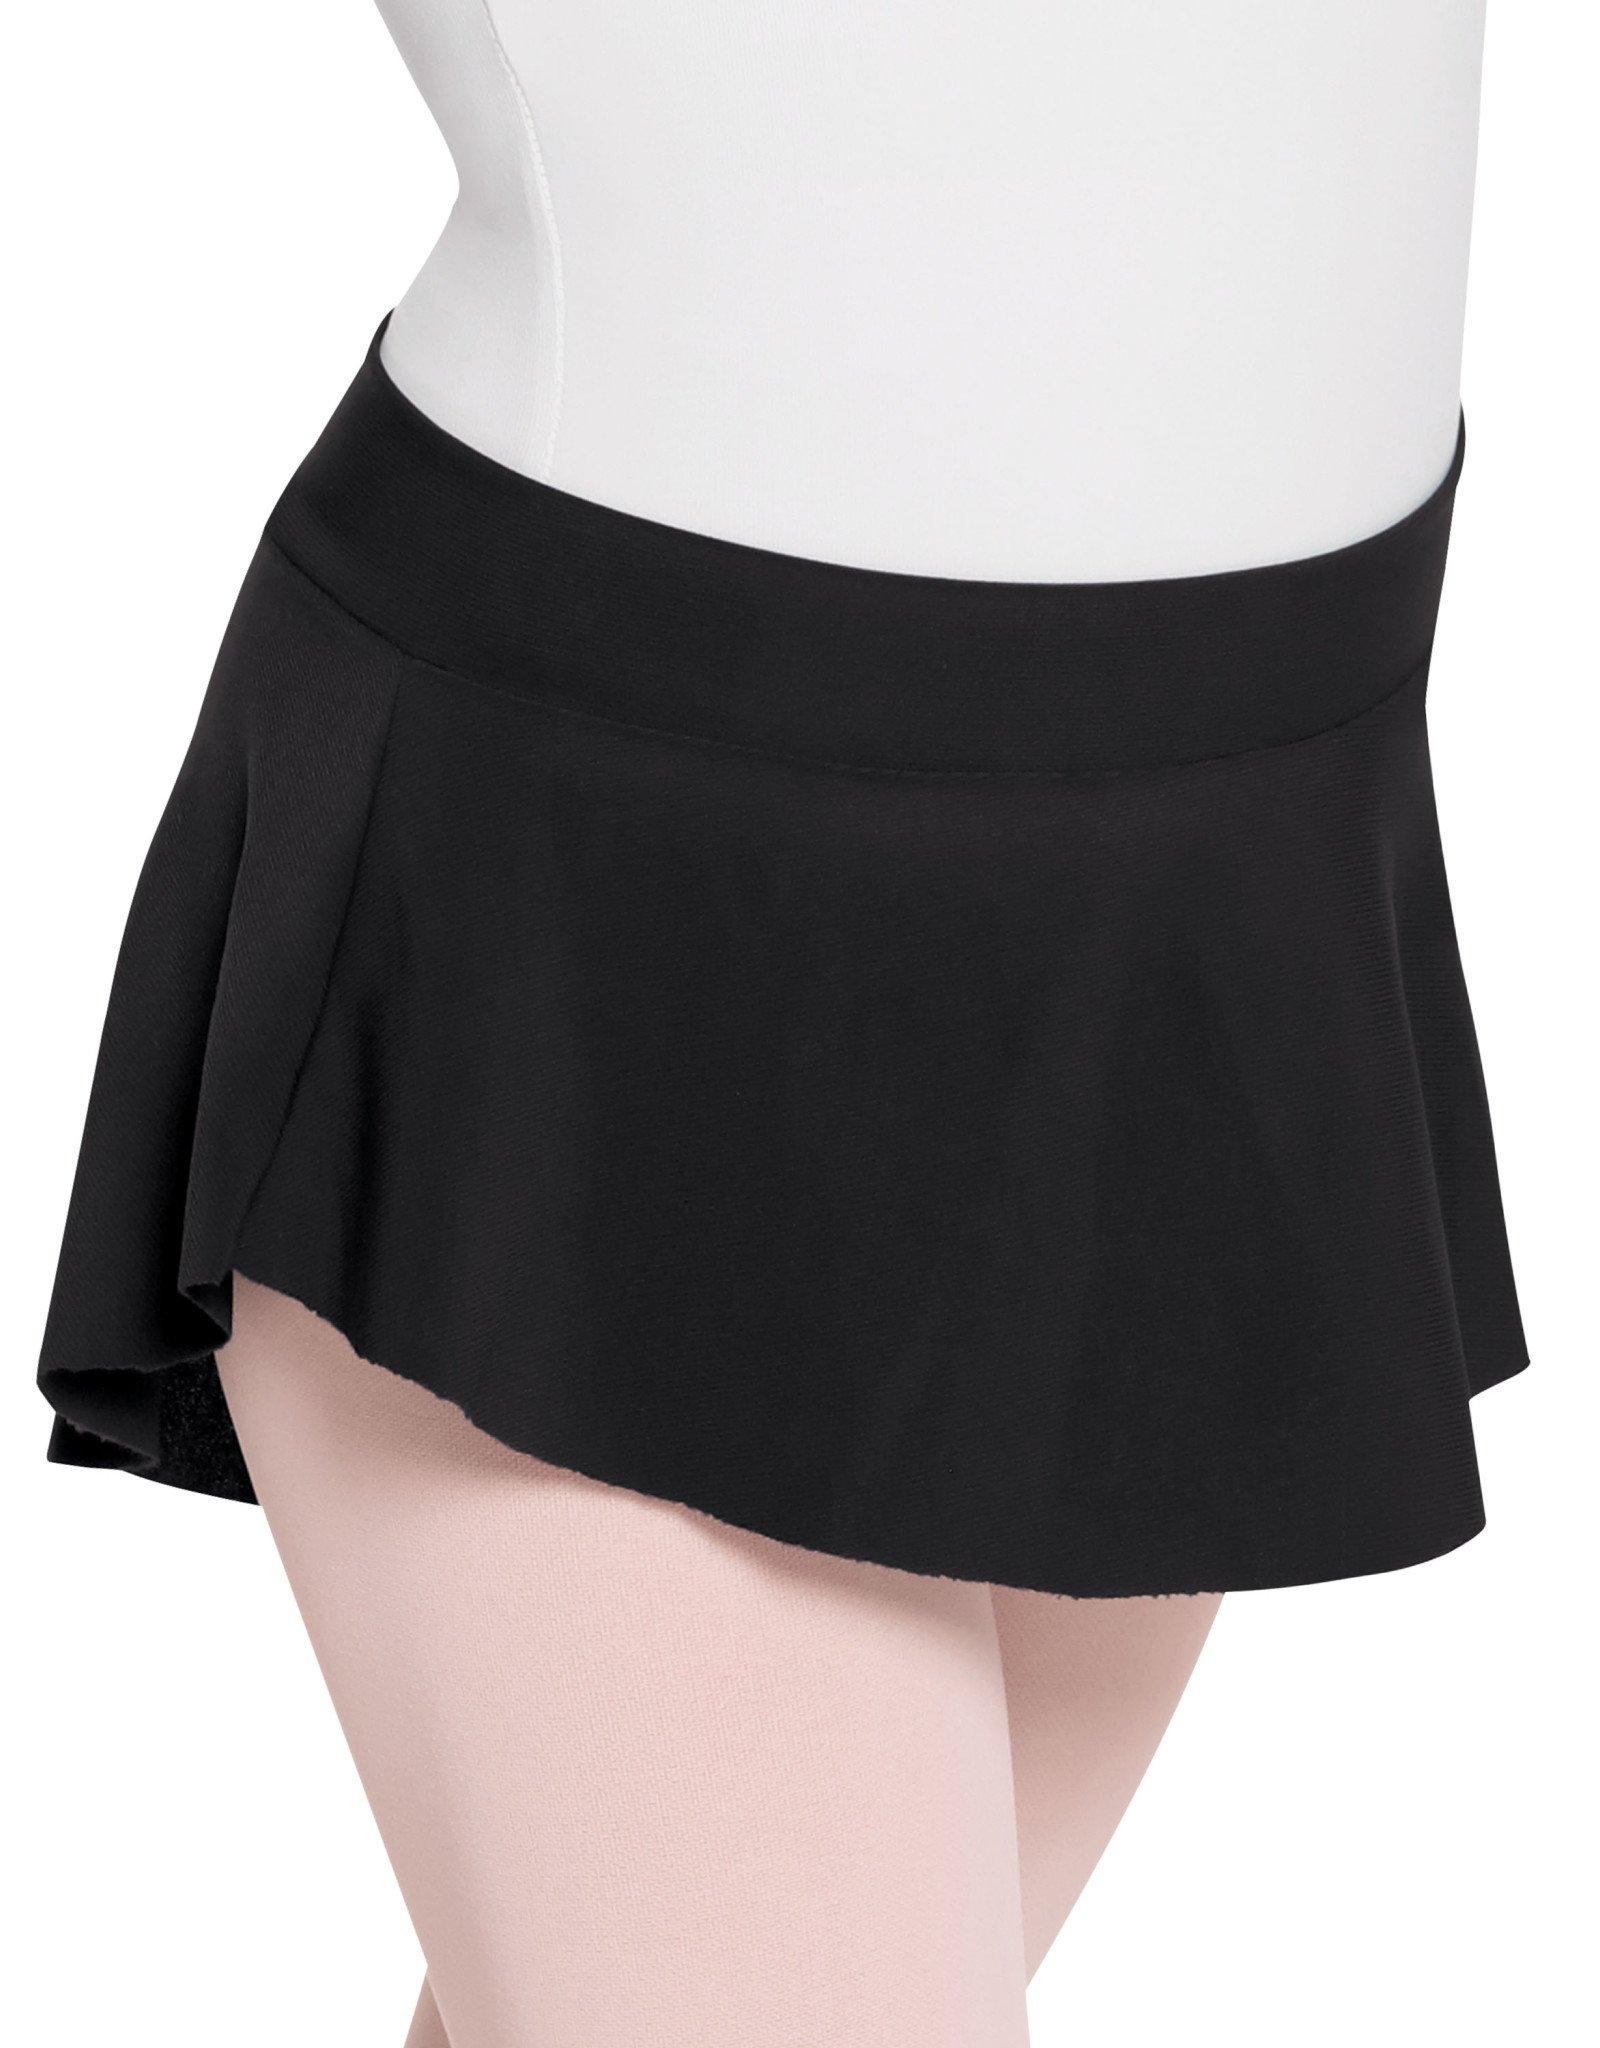 Eurotard Eurotard Child Pull-On Mini Ballet Skirt 6121C